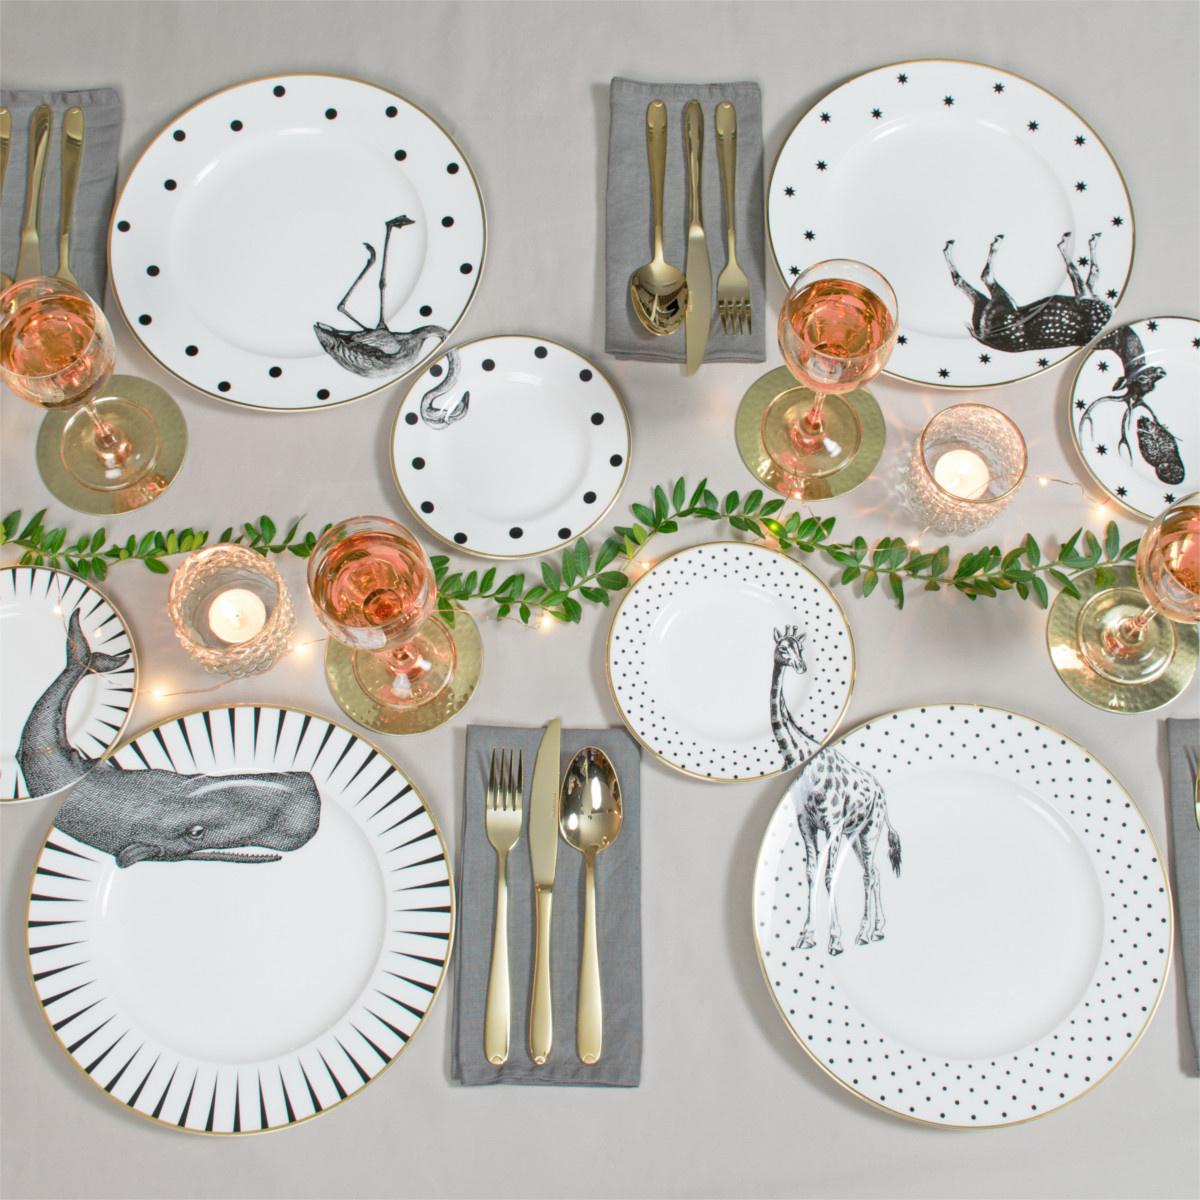 Yvonne Ellen London Monochrome Set of1 Dinner Plate Ø 26,5 cm and 1 Side Plate Ø 16 cm - Giraffe - Bone China - In Beautiful Giftbox